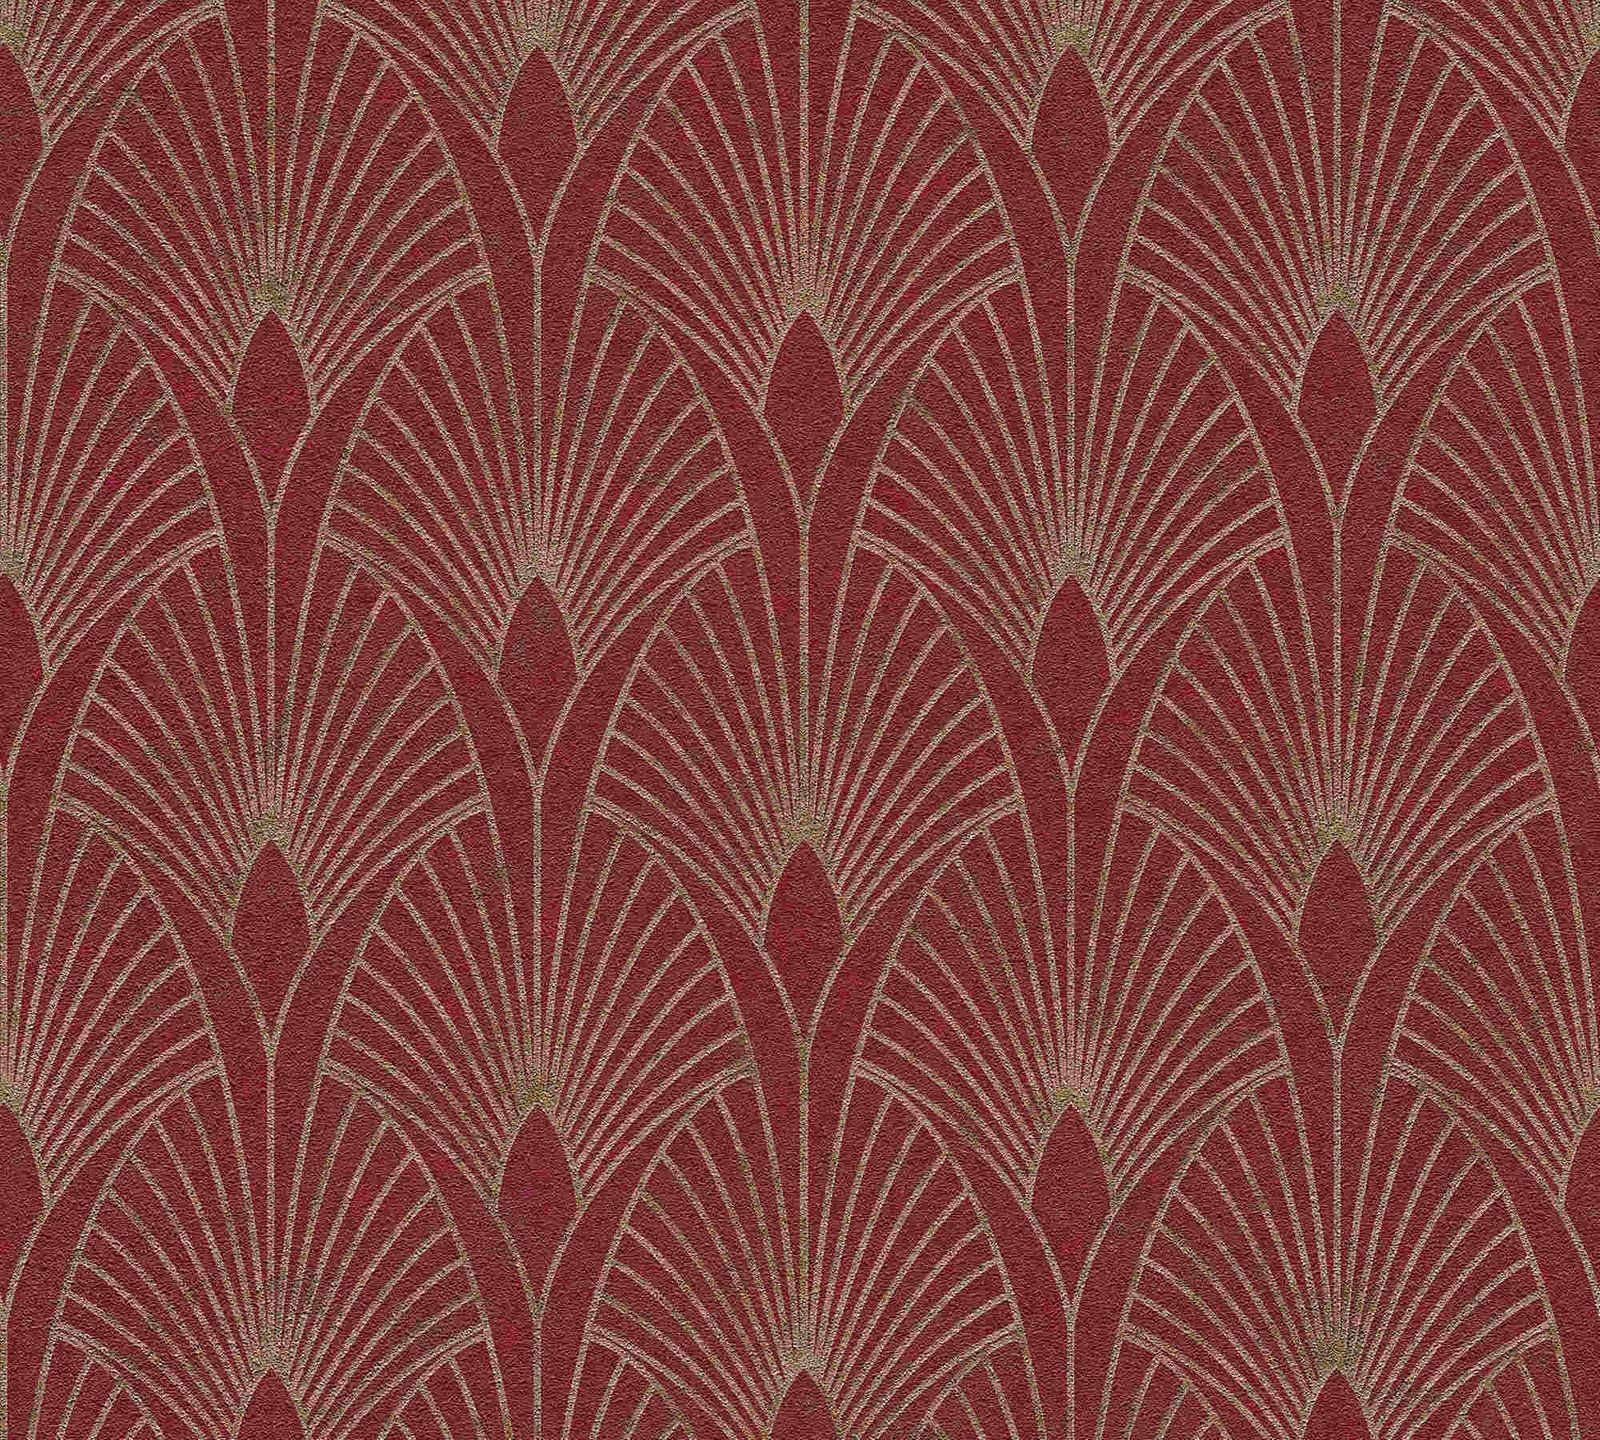 Vliestapete Art Deco rot gold Metallic 37427 4 202228 3